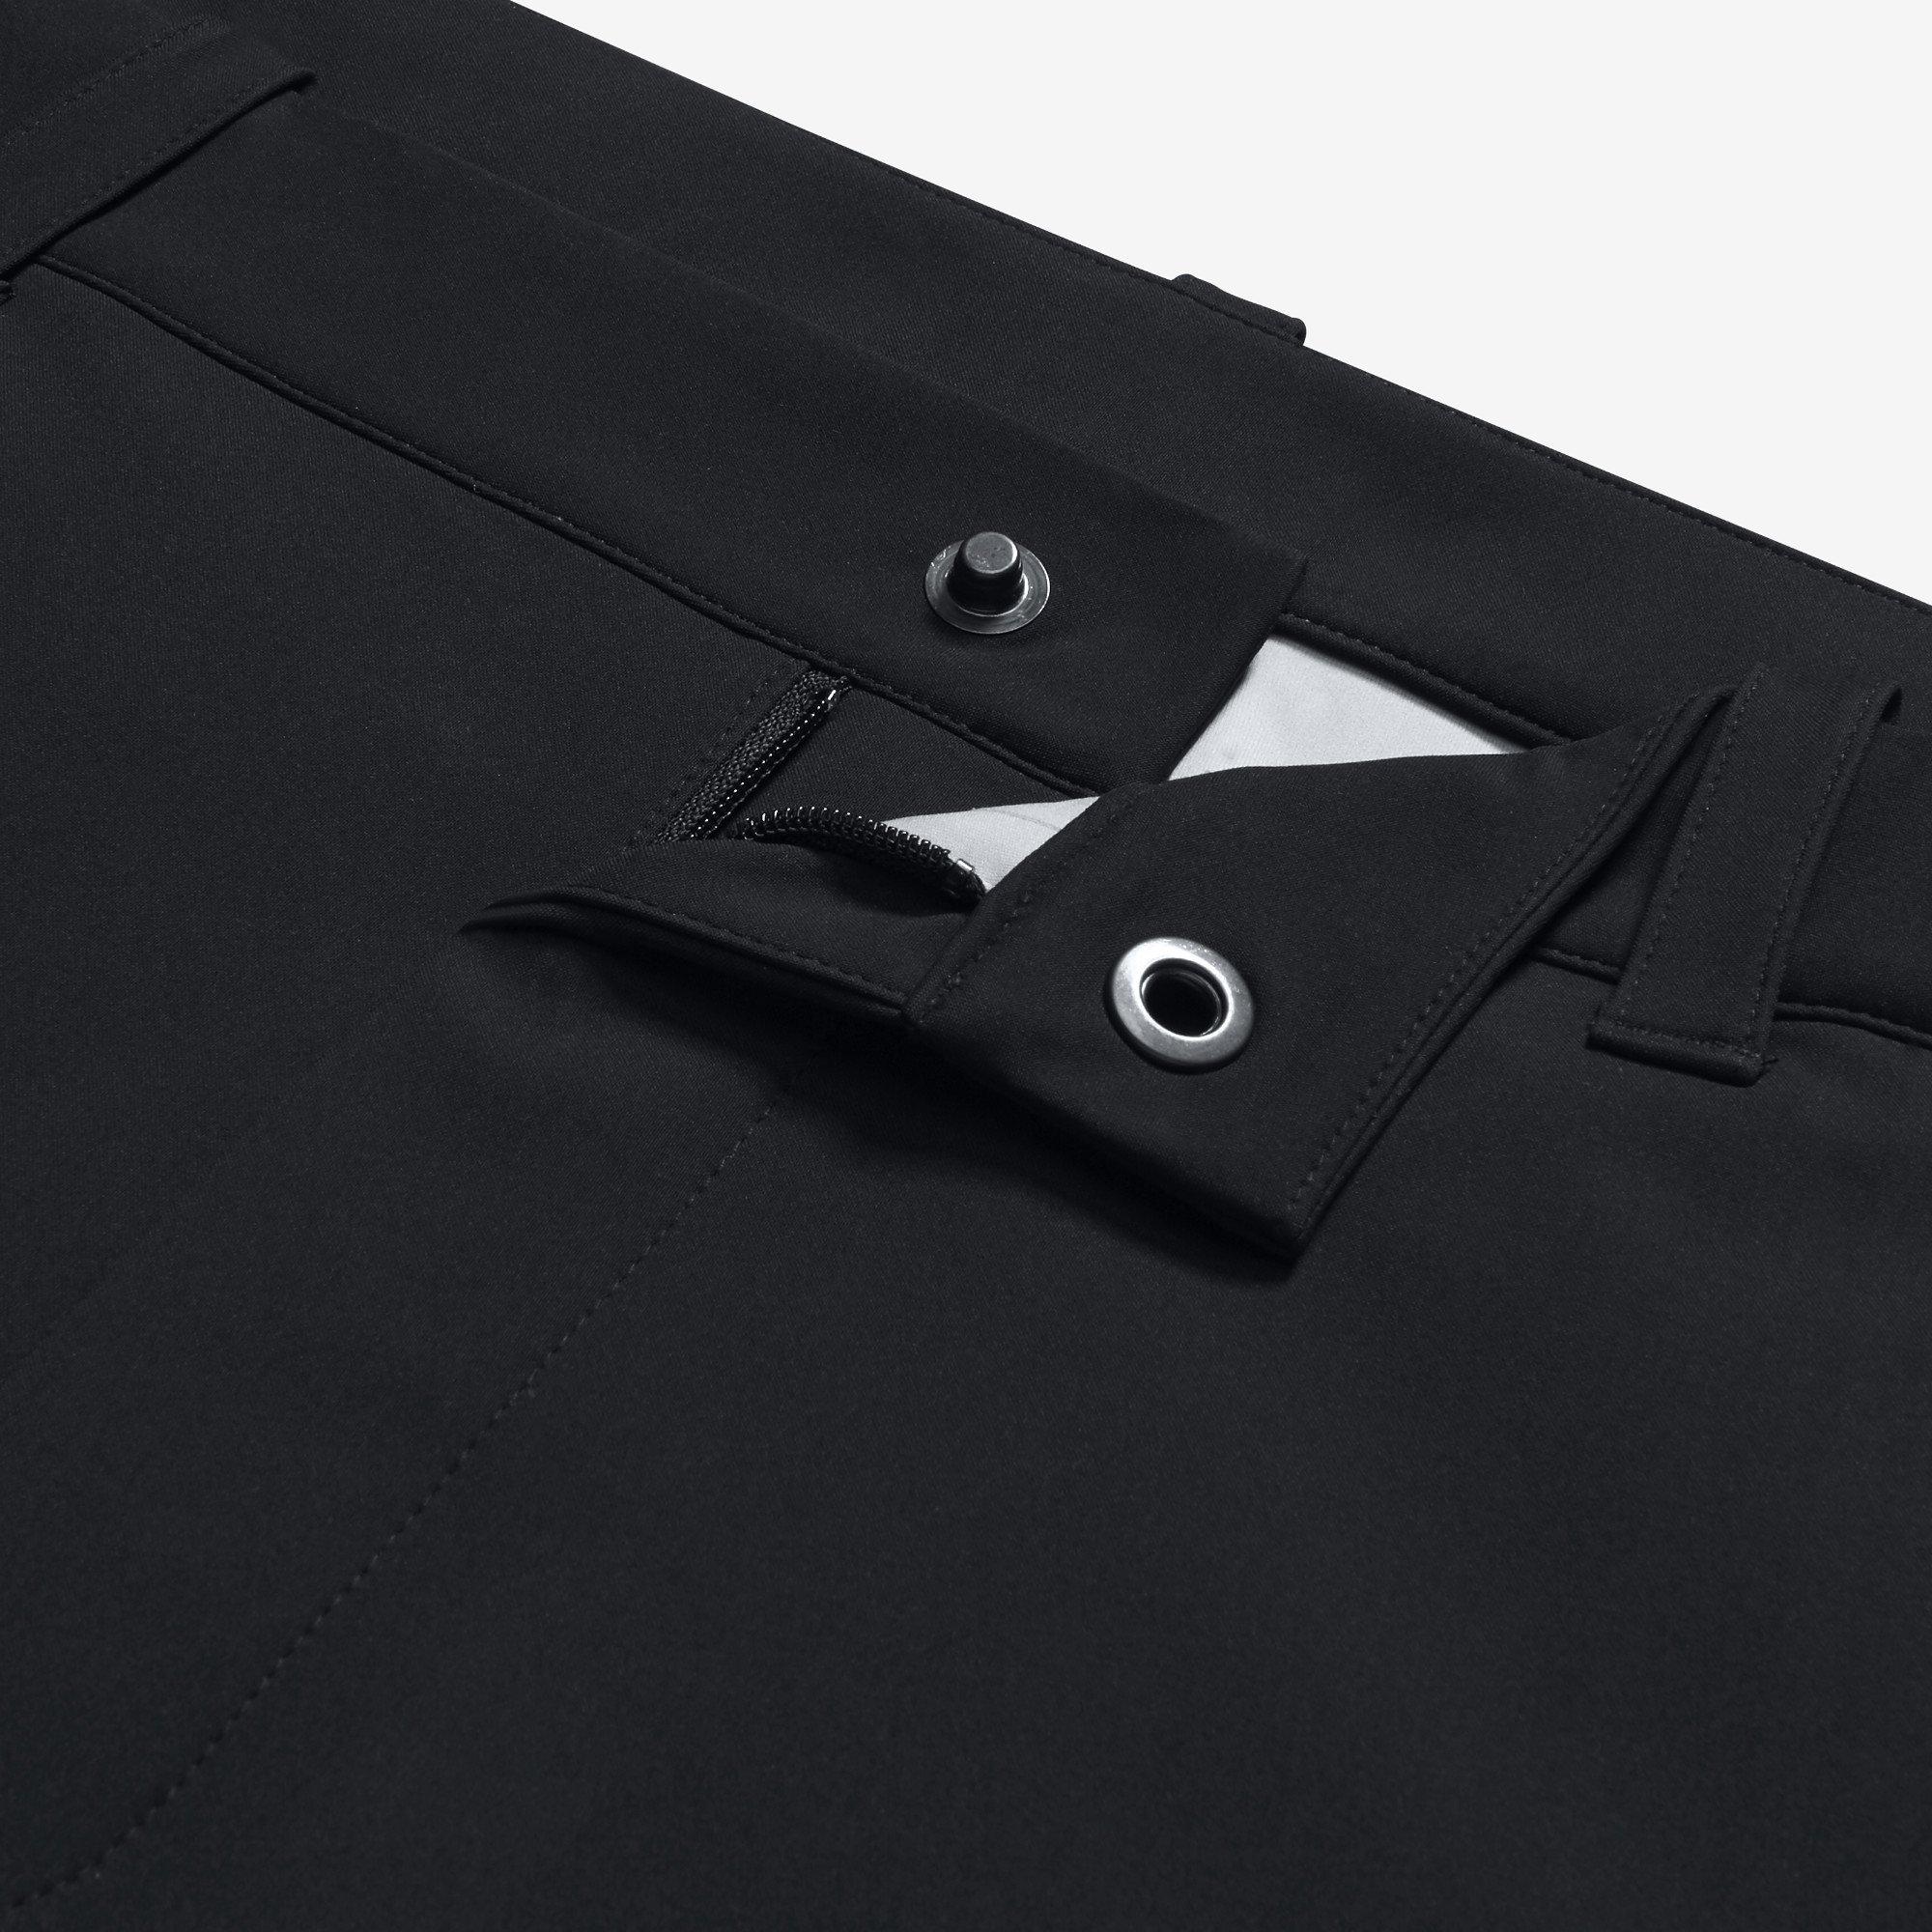 Nike Men's Hyper Storm-FIT Golf Pants by Nike Golf (Image #4)